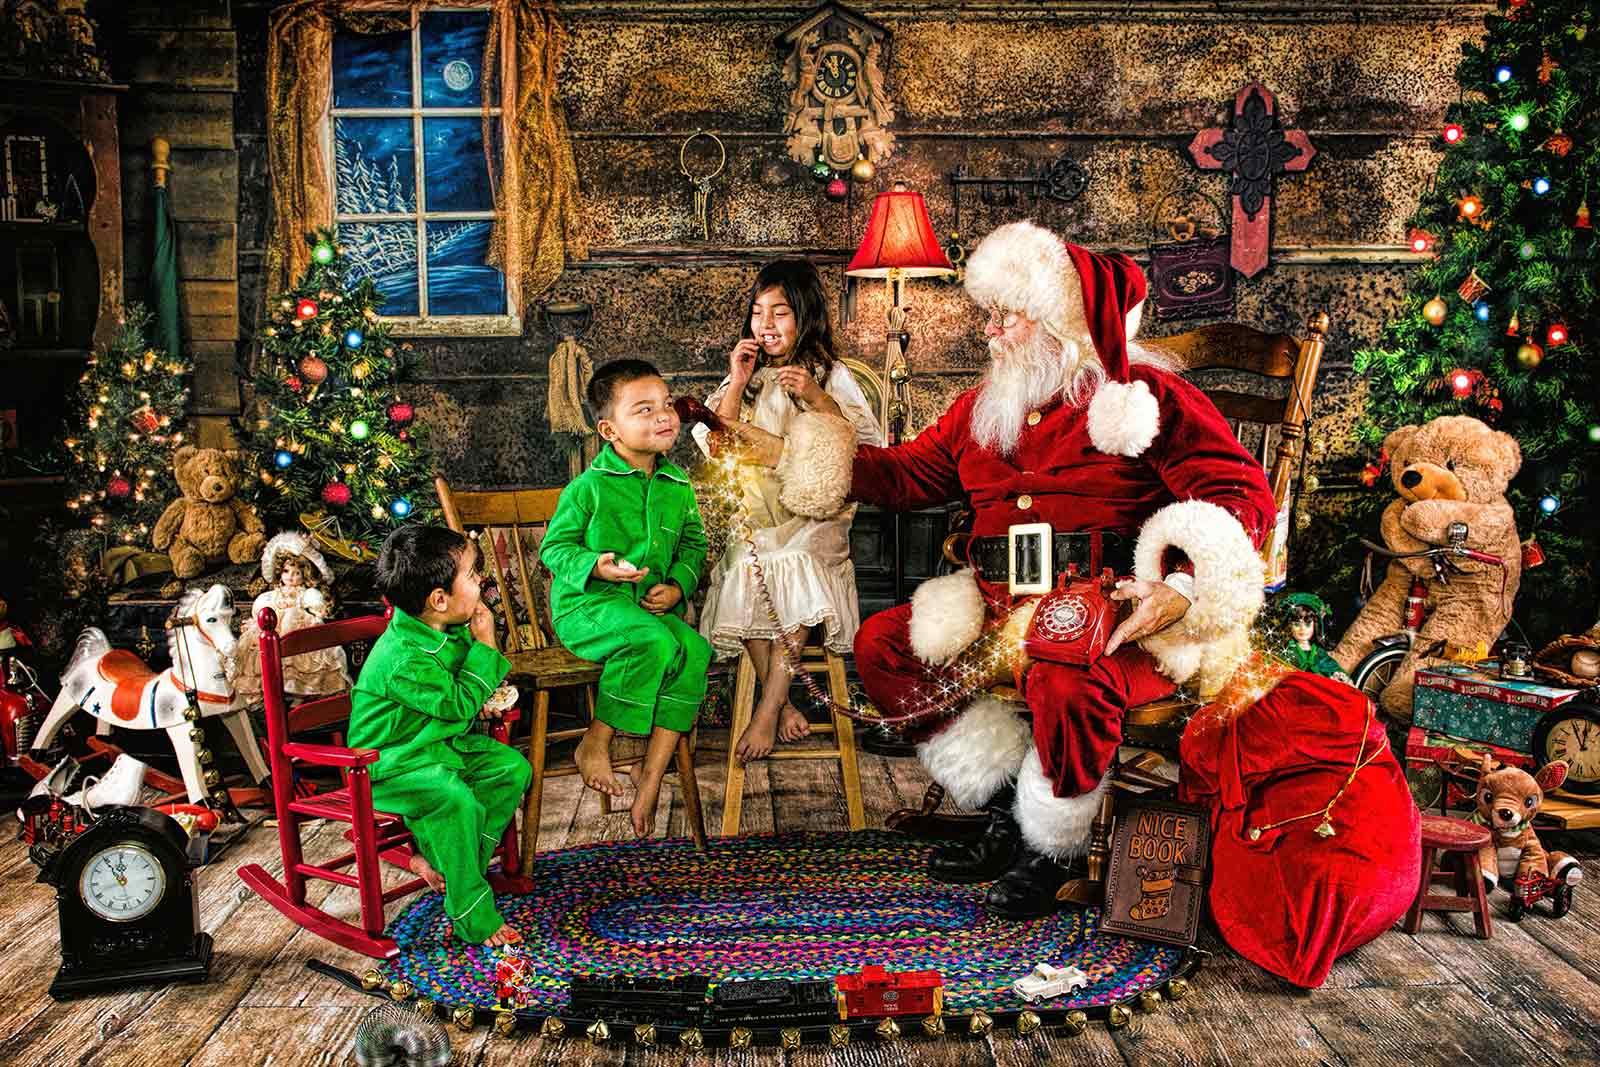 002_Magic-of-Santa-Anna-Thielen-Photography